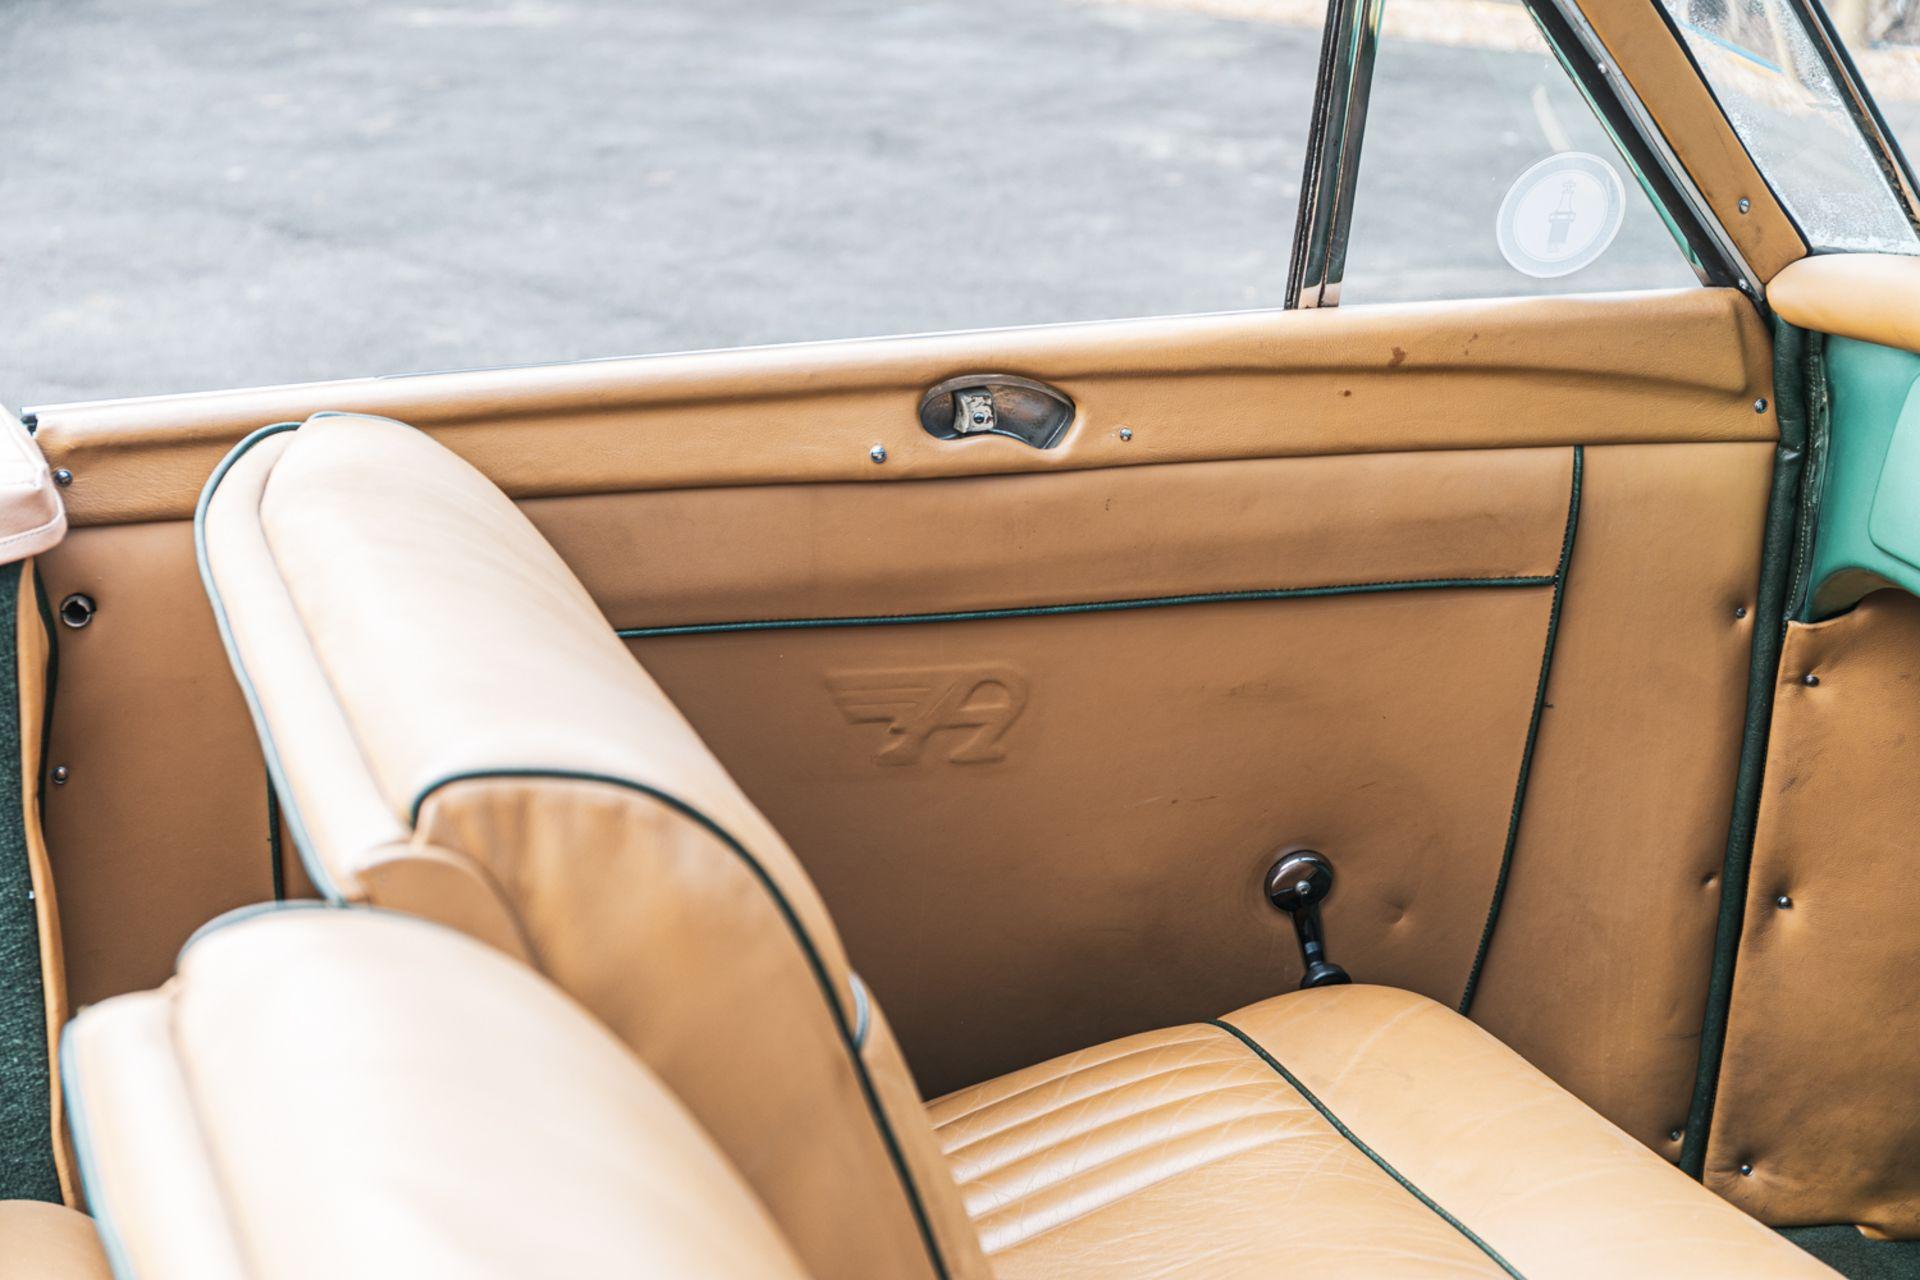 Lot 114 - 1950 Austin A90 Atlantic Convertible